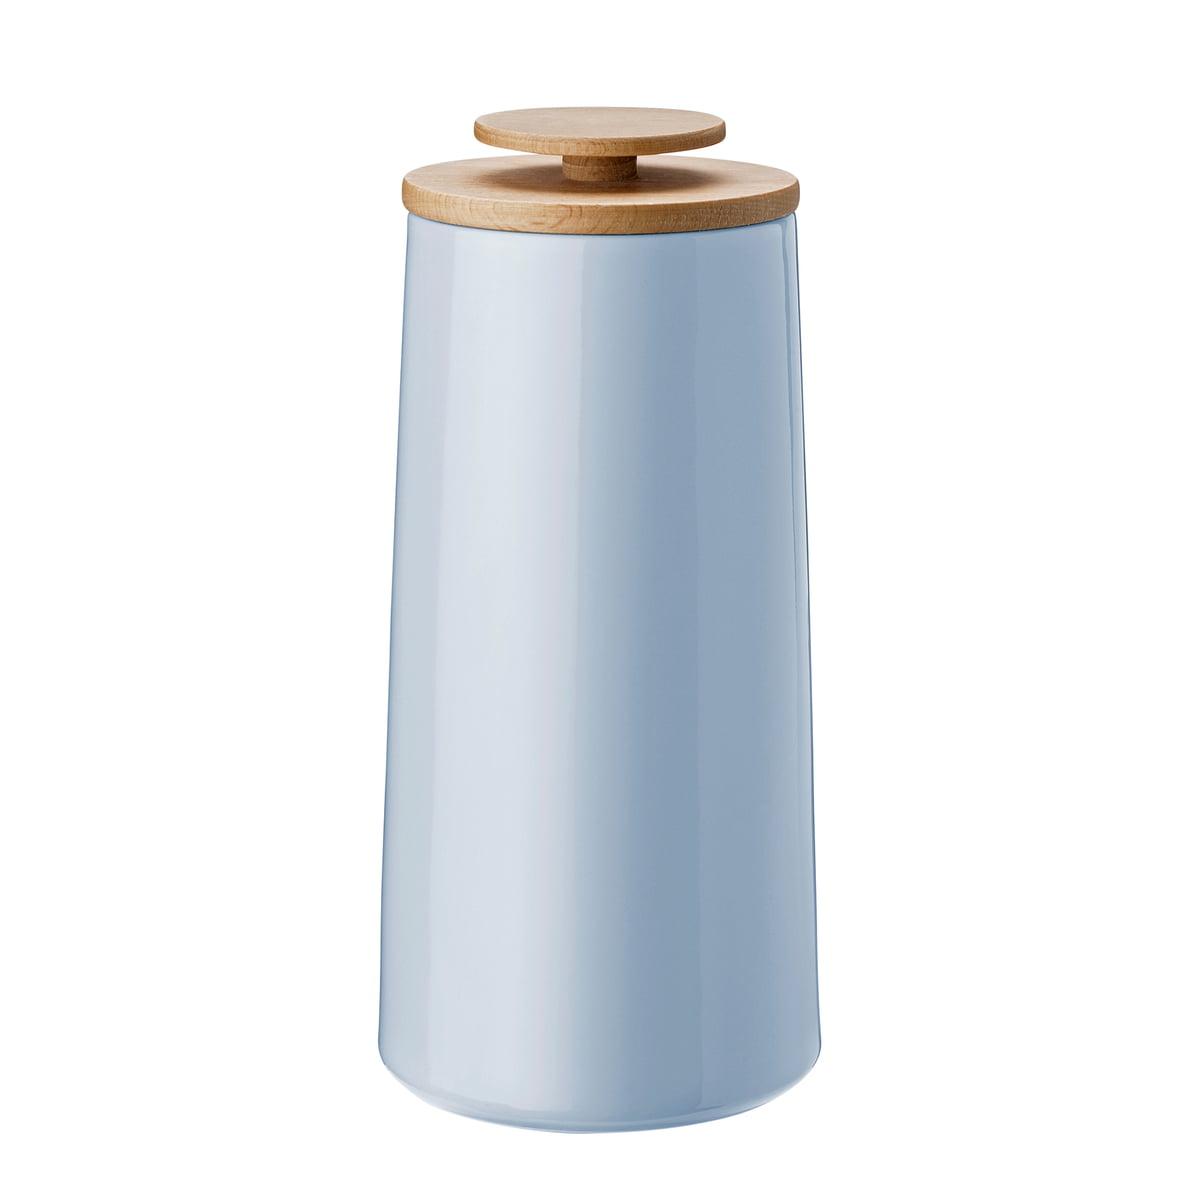 Modernistisk Emma opbevaringsdåser fra Stelton | Connox XJ34